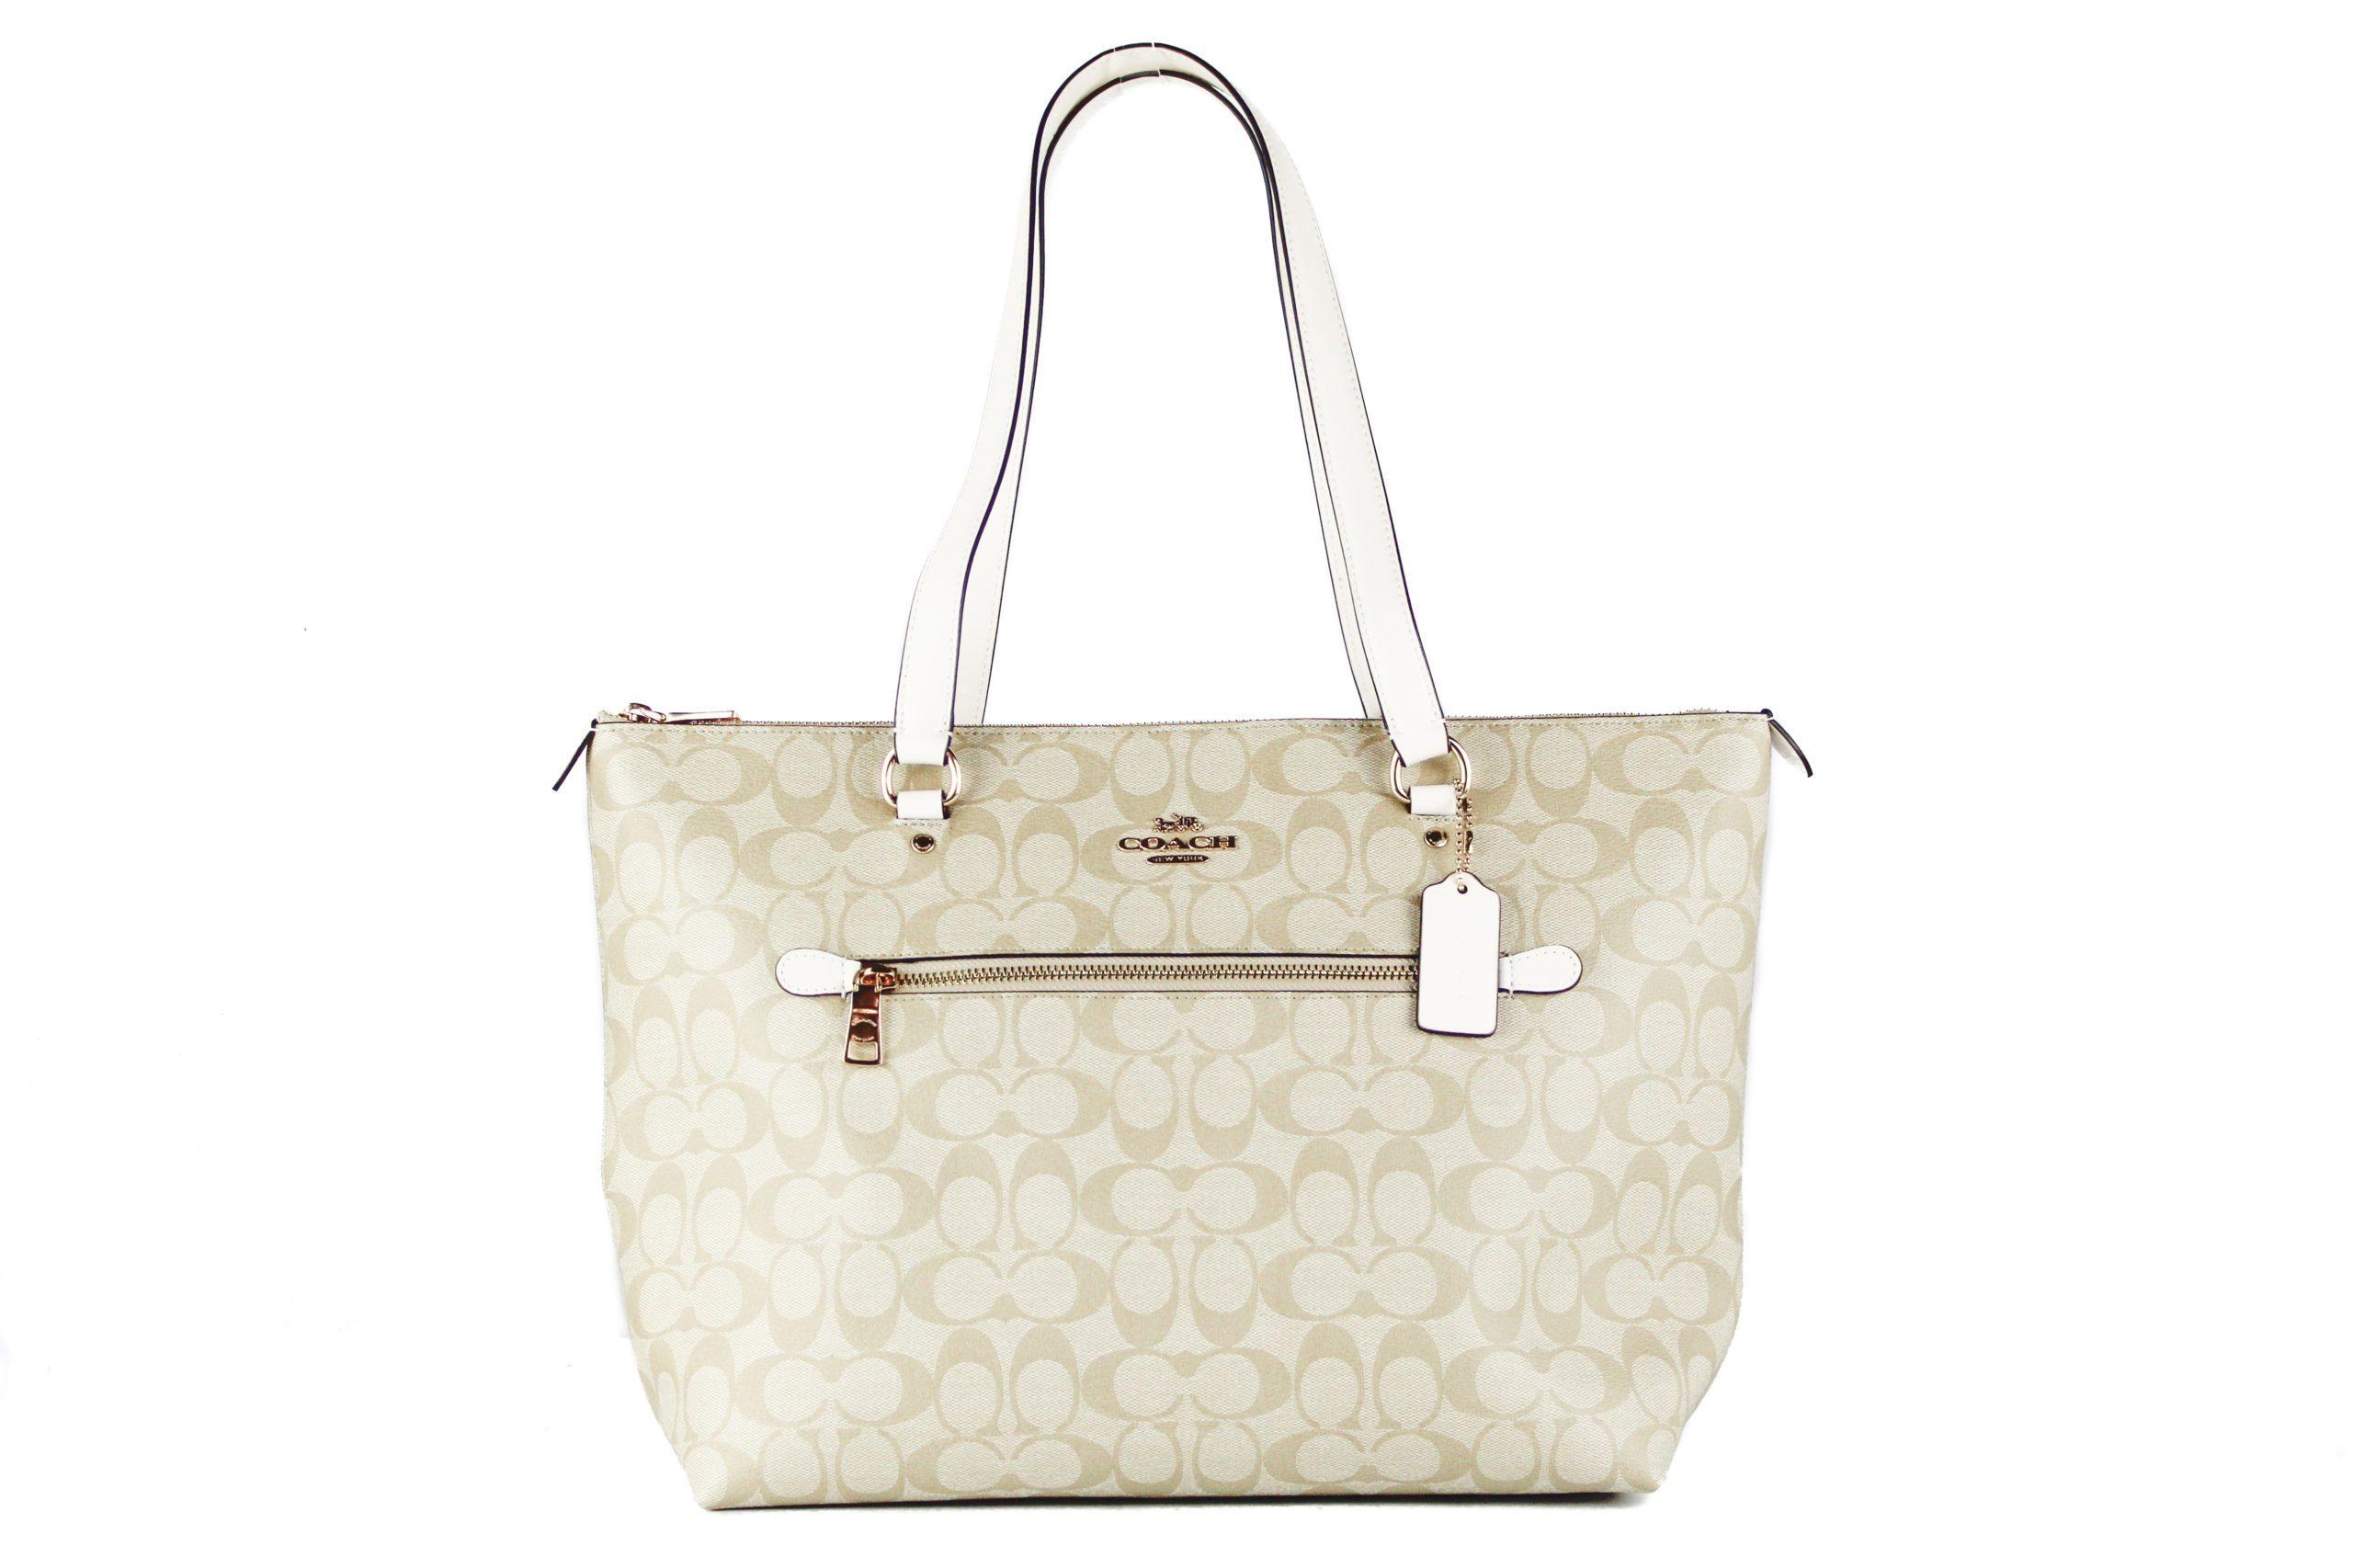 COACH Women's Canvas Leather Tote Bag Khaki 504339